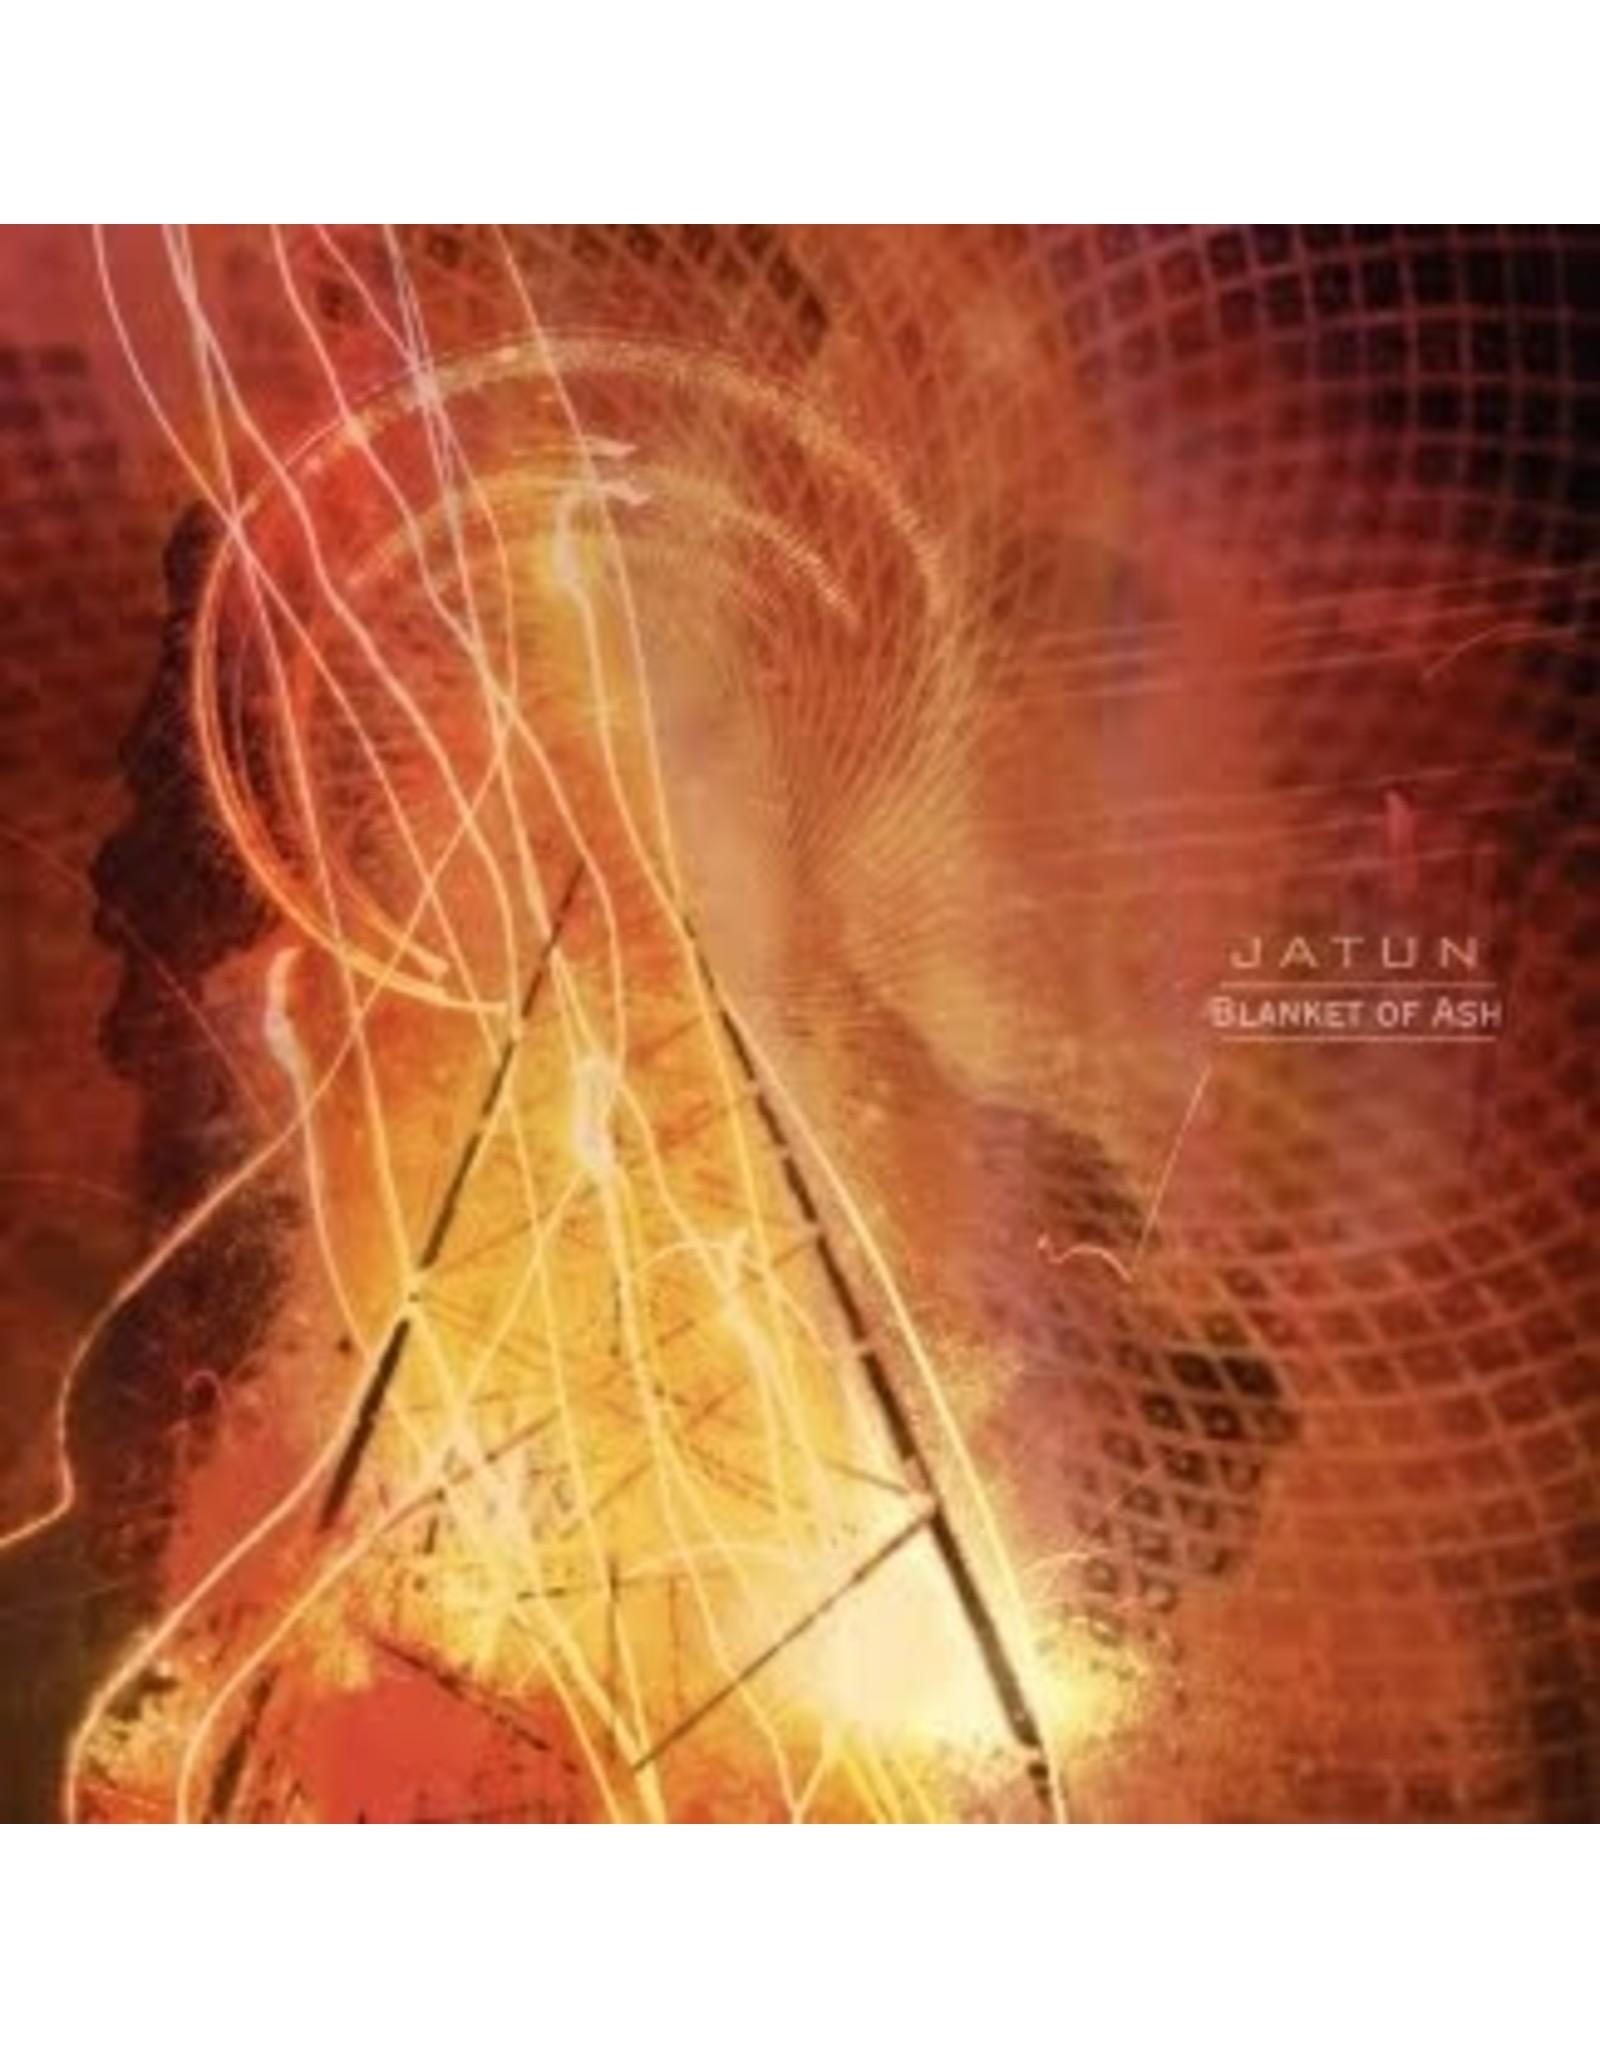 New Vinyl Jatun - Blanket Of Ash LP